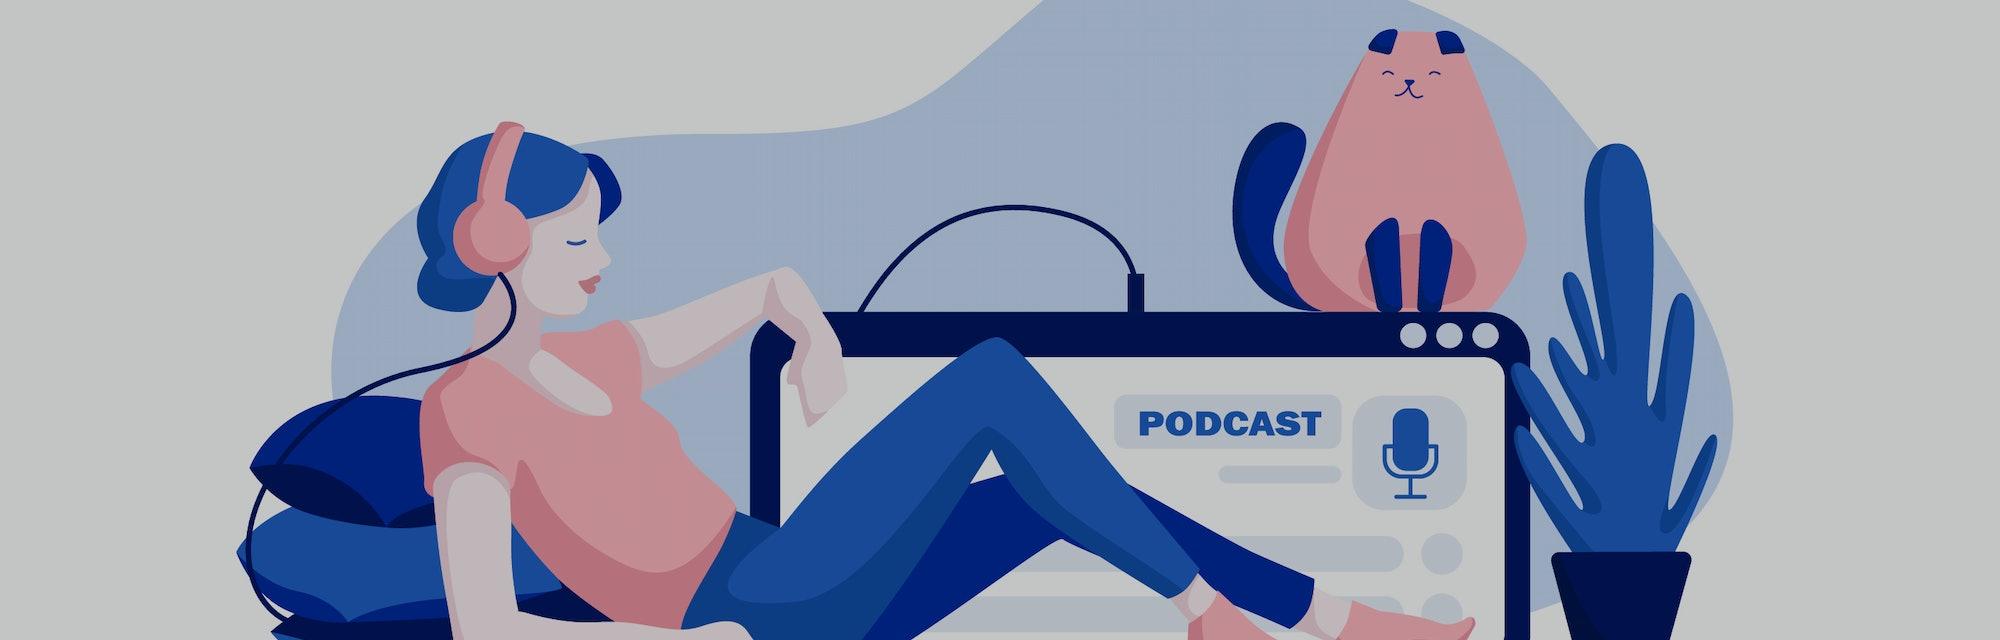 Podcast concept illustration. Webinar, online training, tutorial podcast concept. Young female liste...